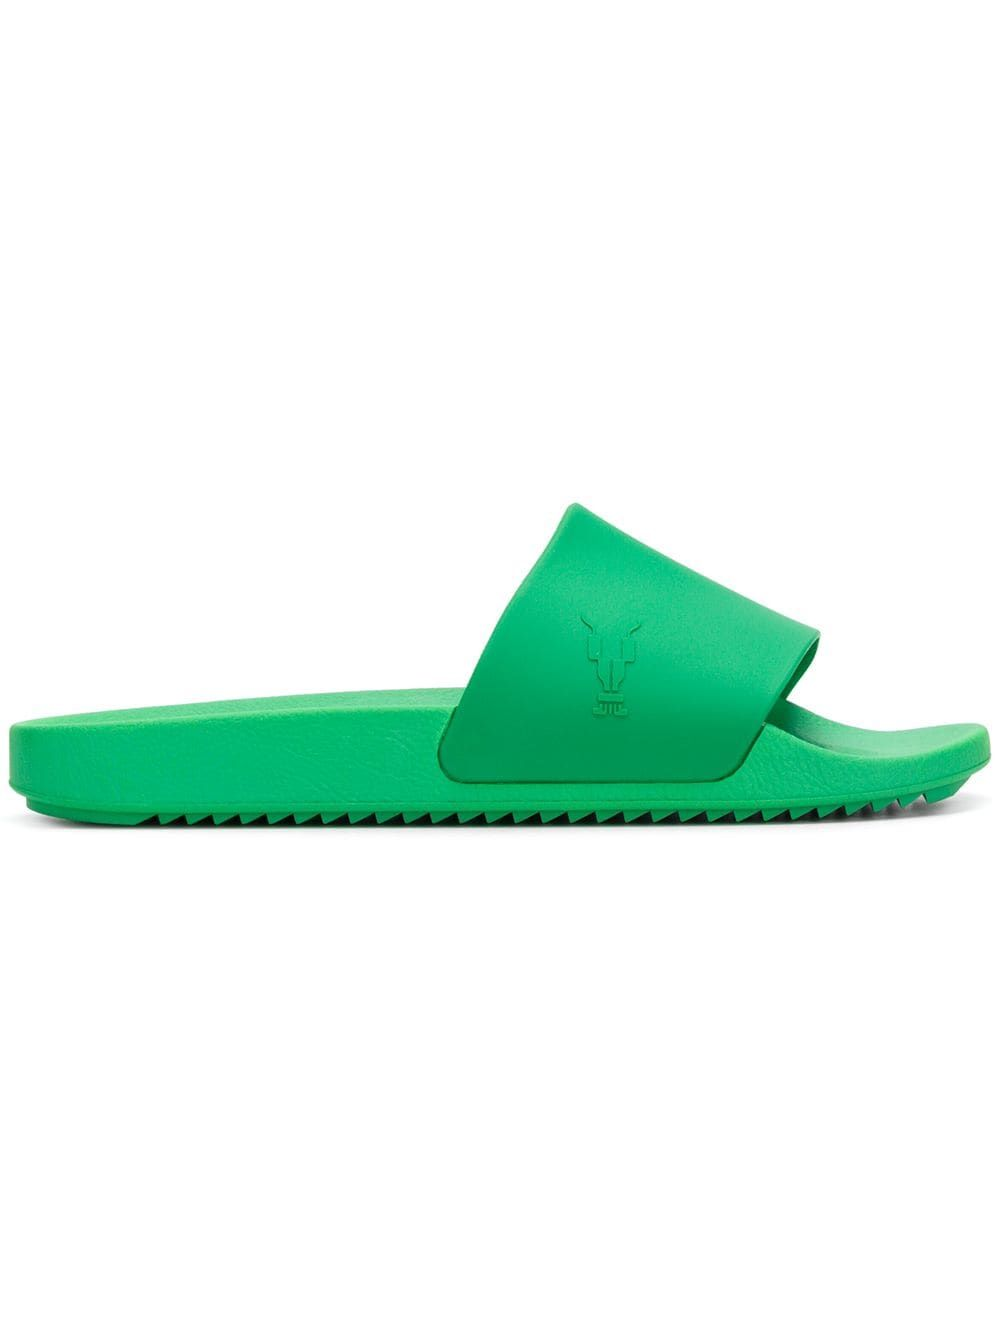 9997a53b9850 RICK OWENS DRKSHDW RICK OWENS DRKSHDW LOGO SLIDES - GREEN.   rickowensdrkshdw  shoes